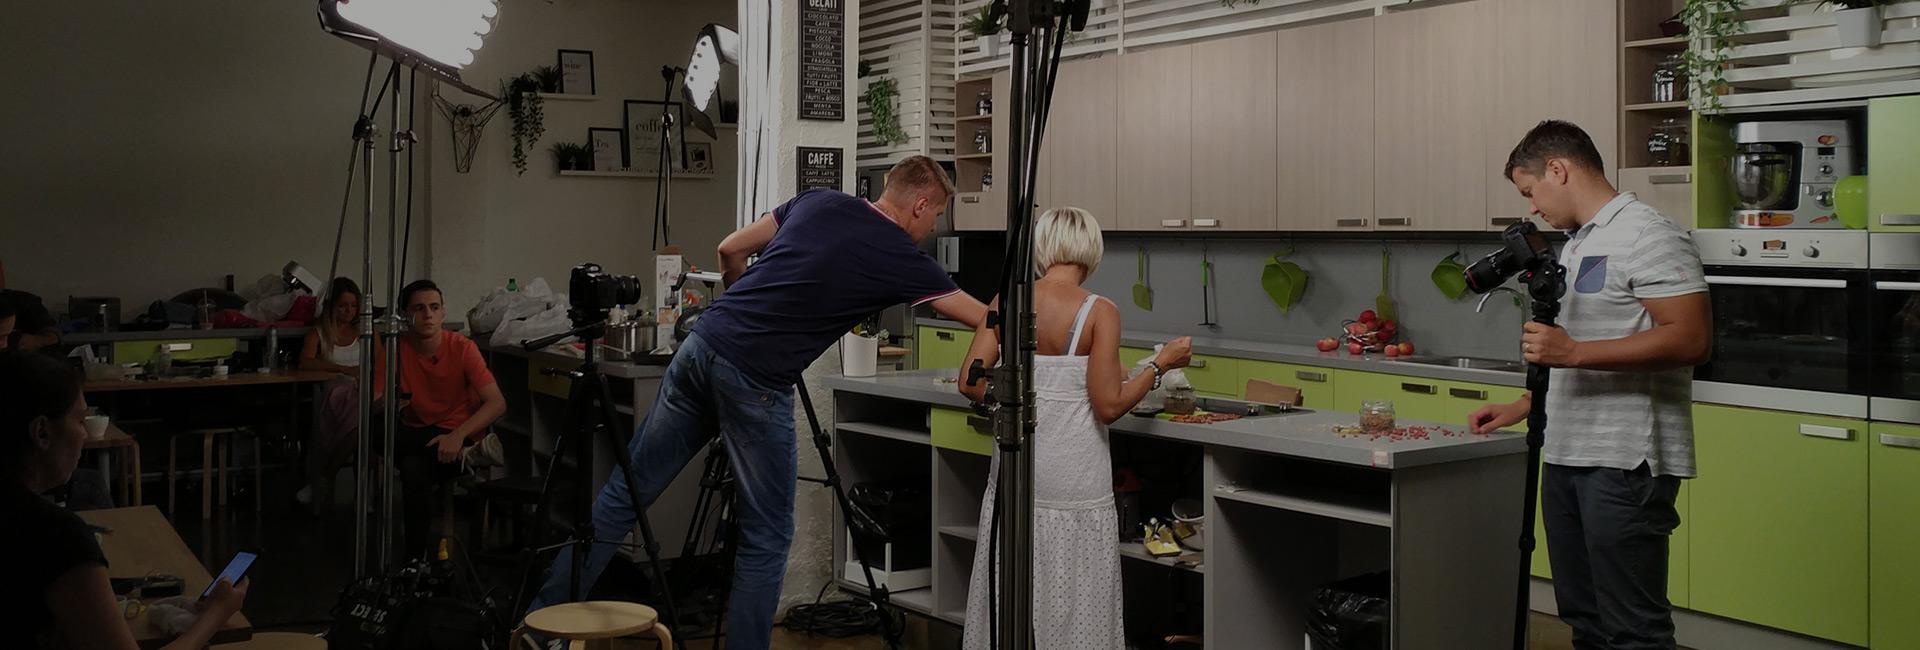 аренда кулинарной лофт студии для съемок